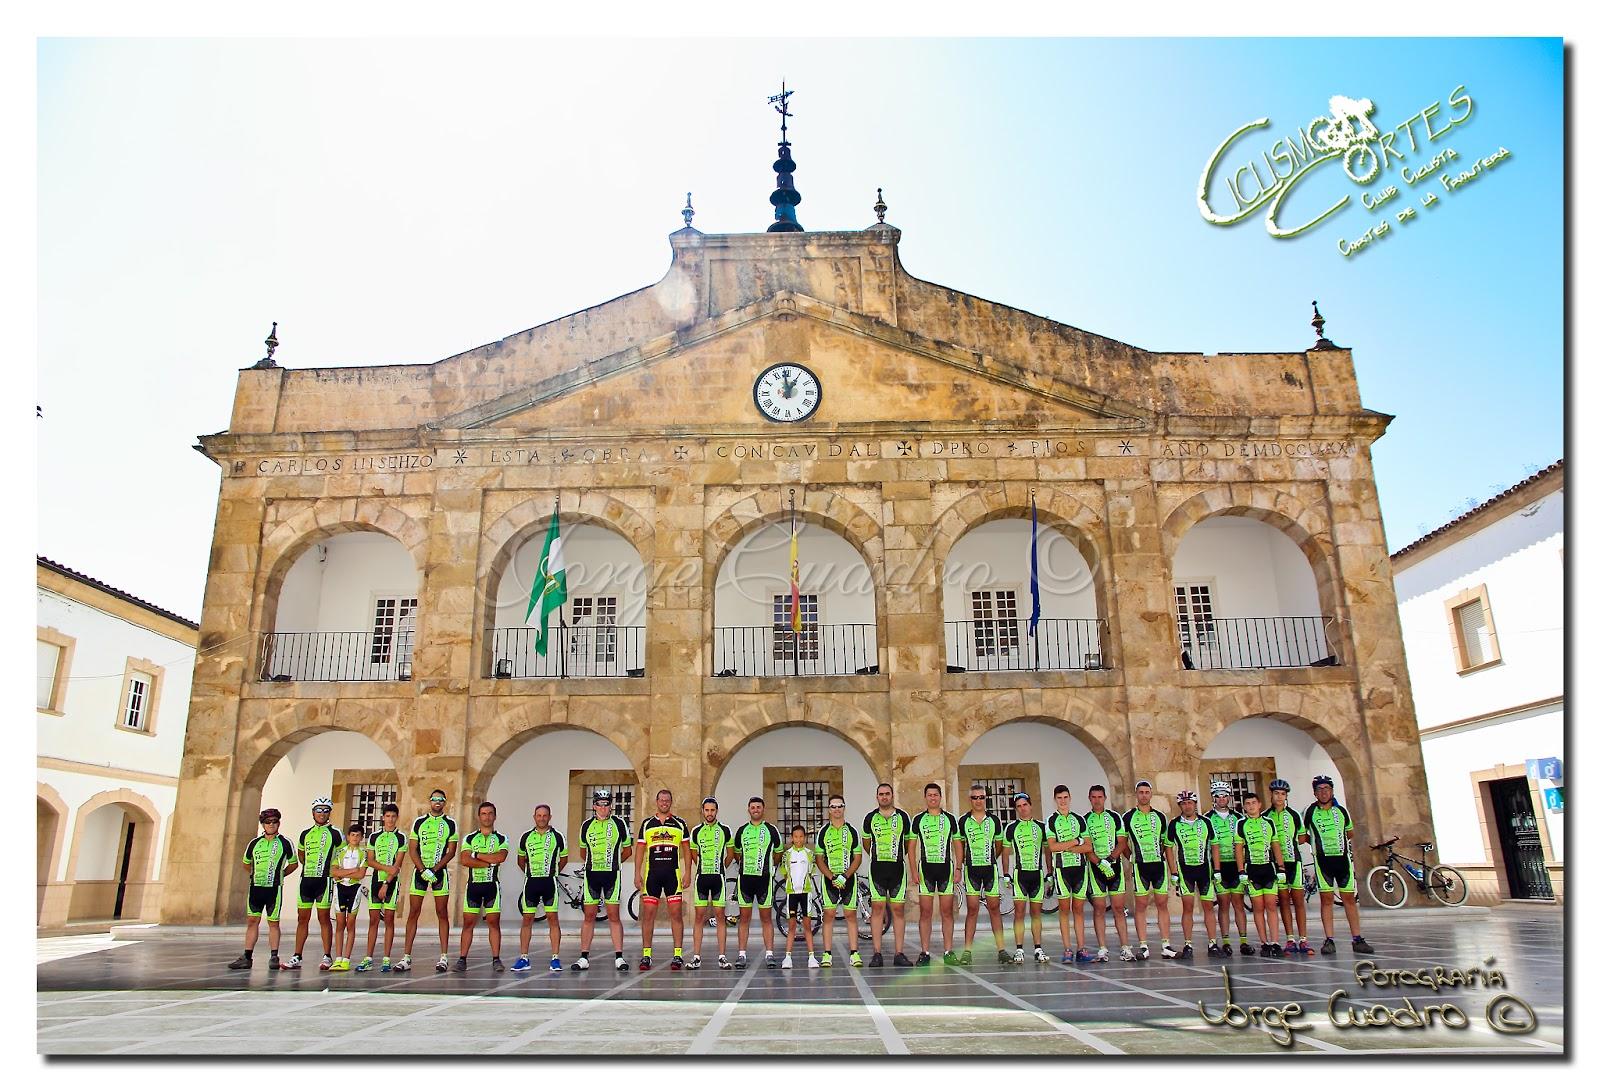 Foto Video Jorge Cuadro C Club Ciclista Cortes De La Frontera